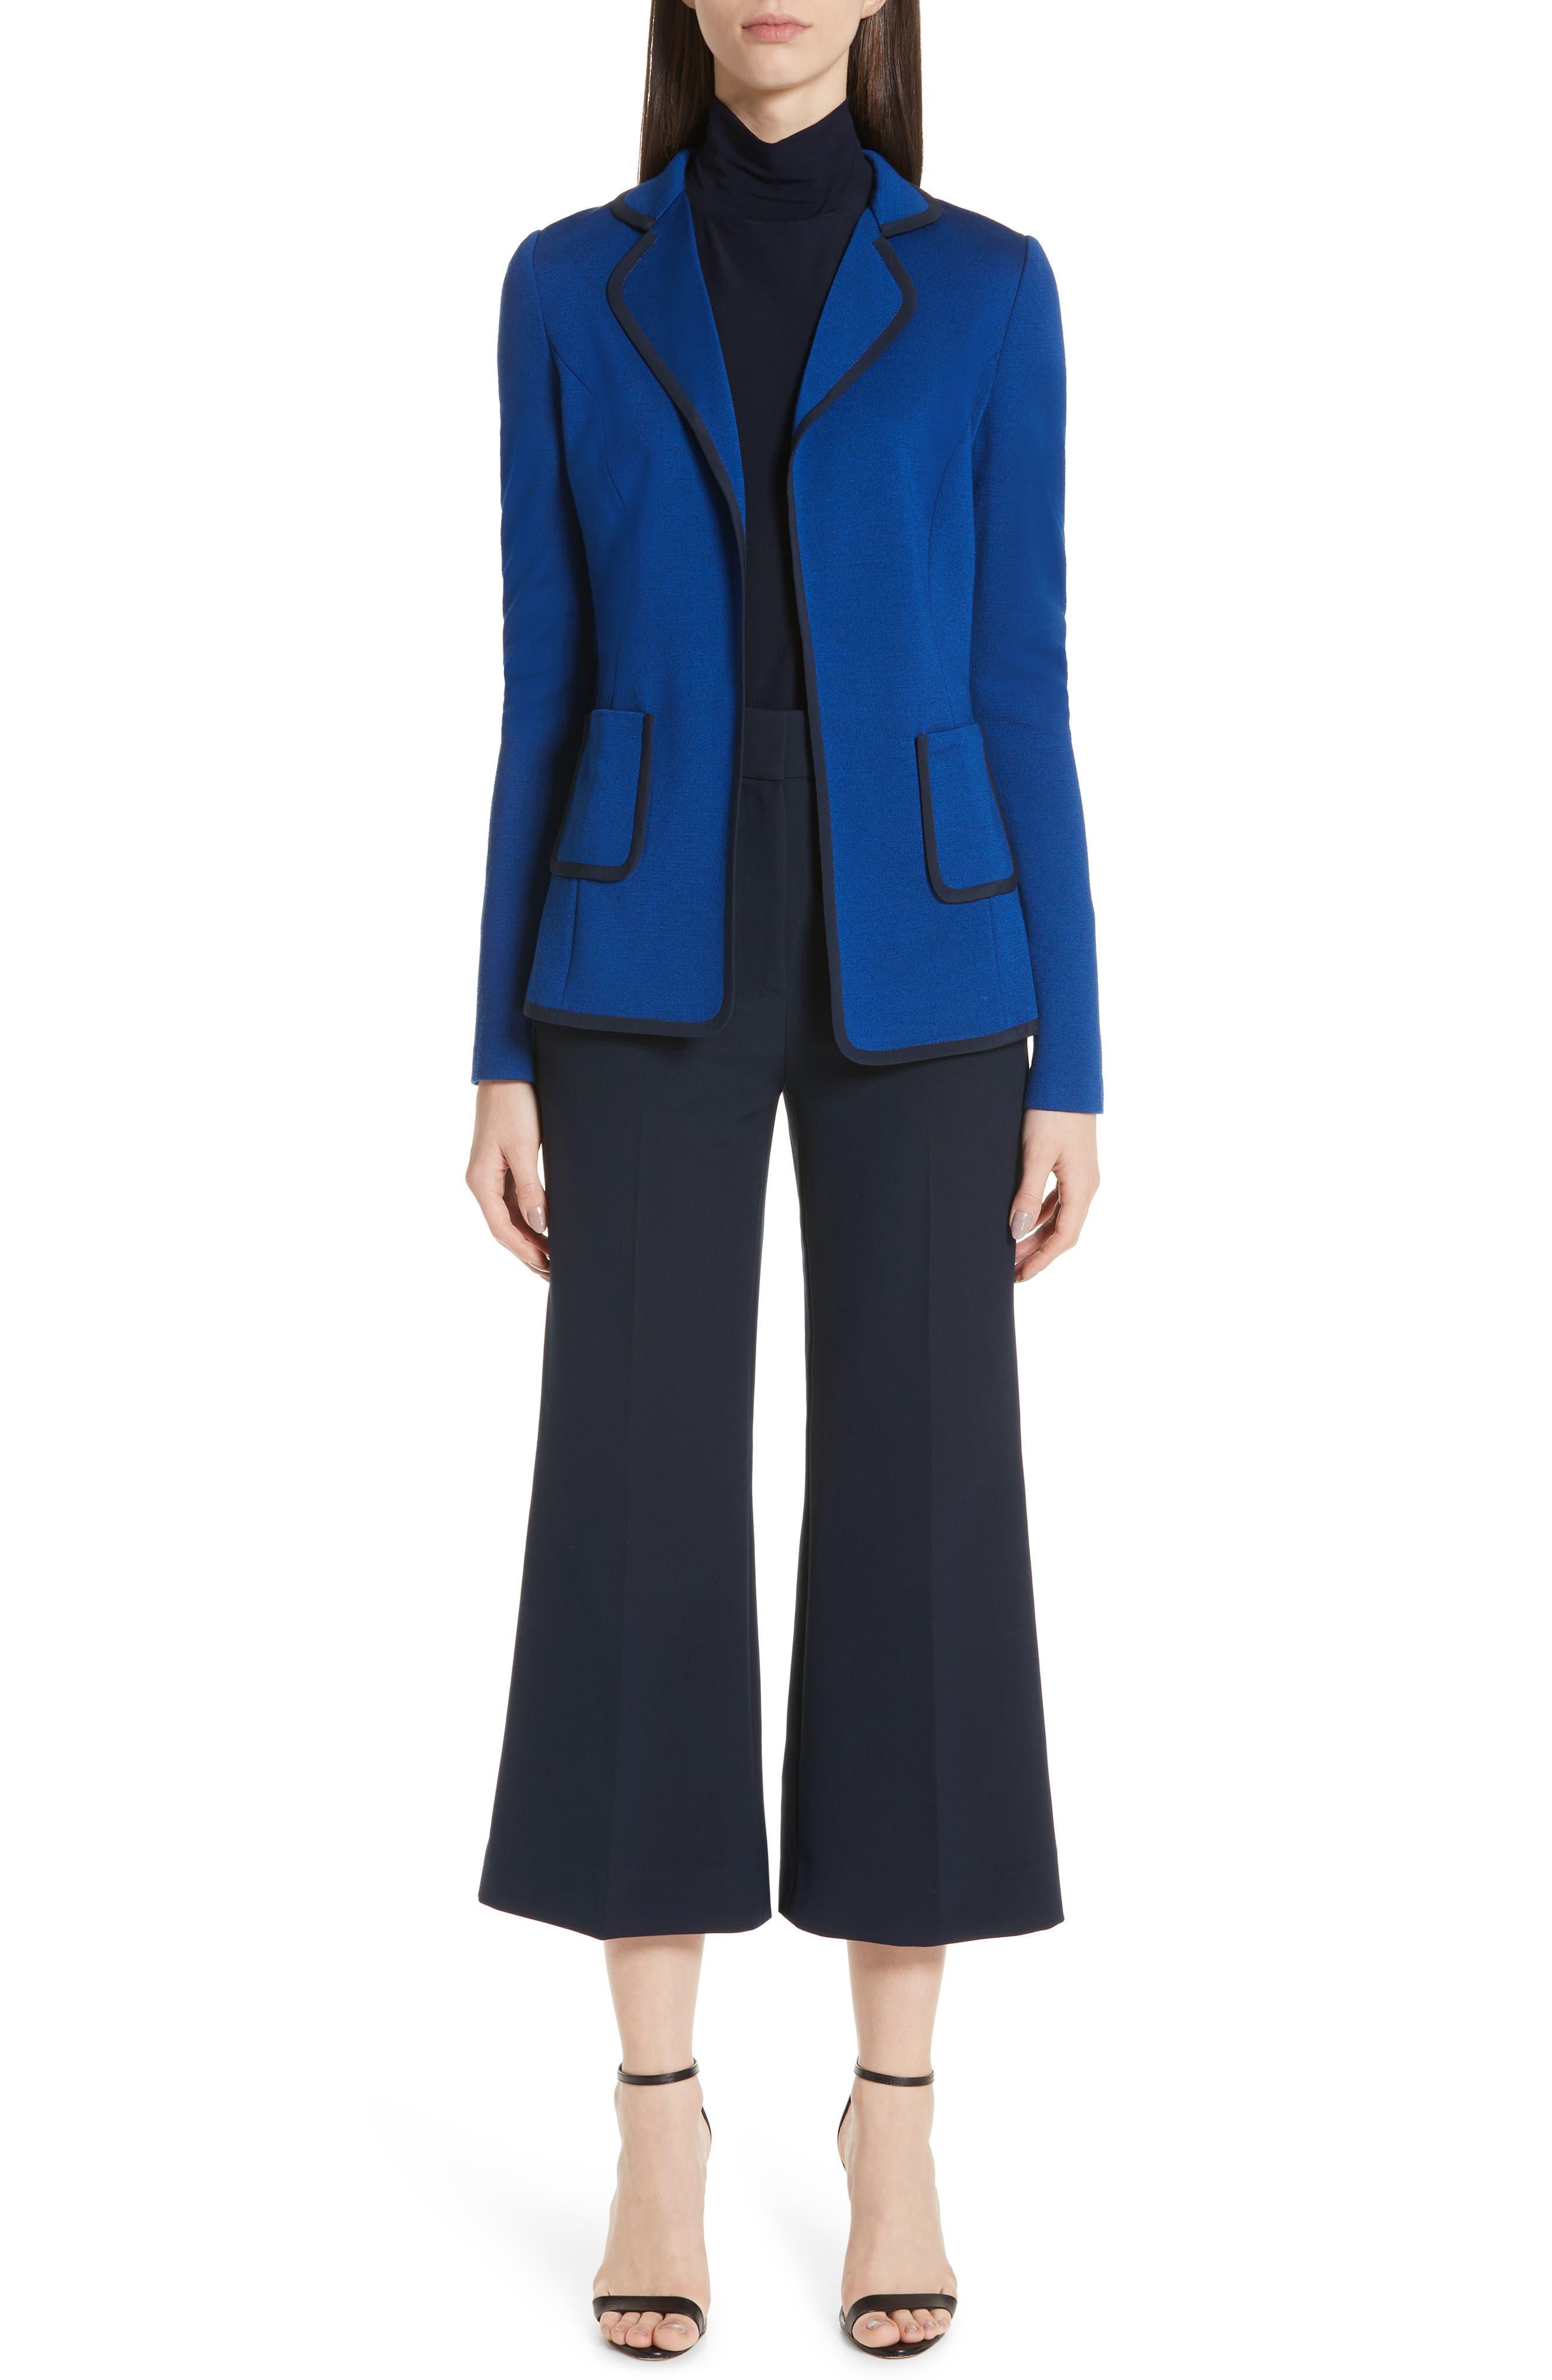 ST. JOHN COLLECTION, Patch Pocket Milano Knit Jacket, Alternate thumbnail 8, color, AZUL/ NAVY